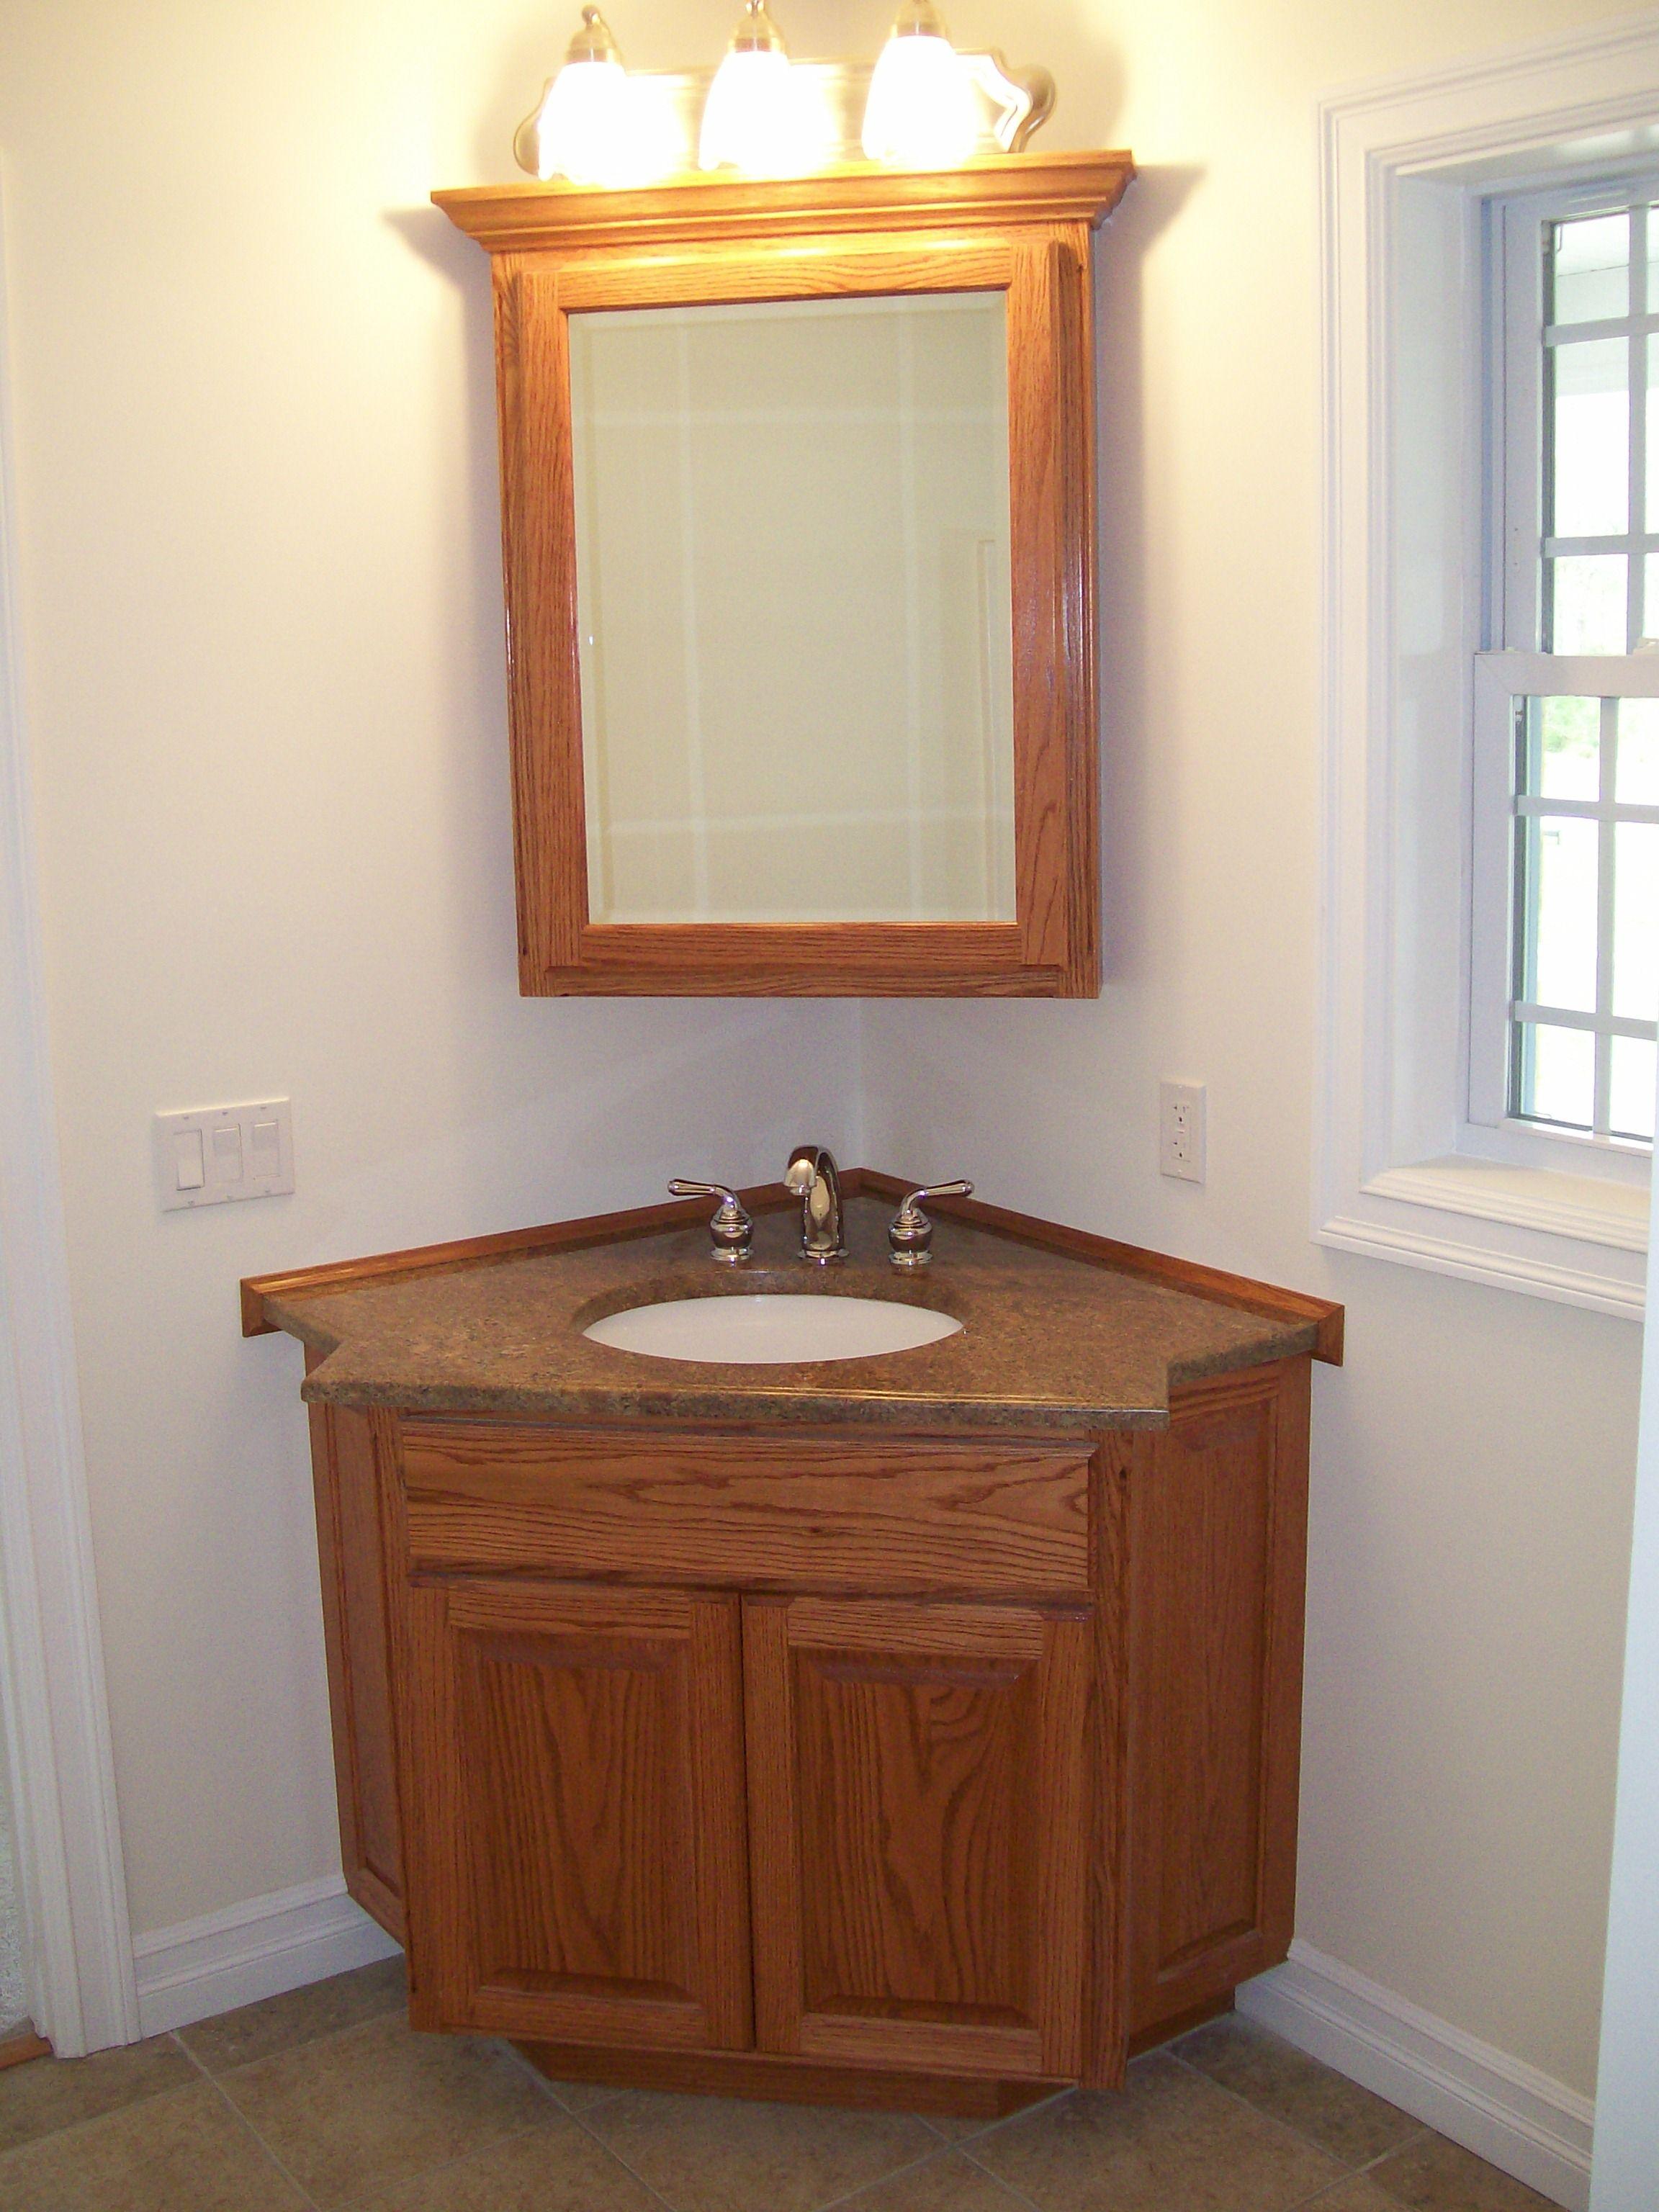 Corner Bathroom Medicine Cabinet Ideas Small Bathroom Vanities Corner Bathroom Vanity Corner Vanity